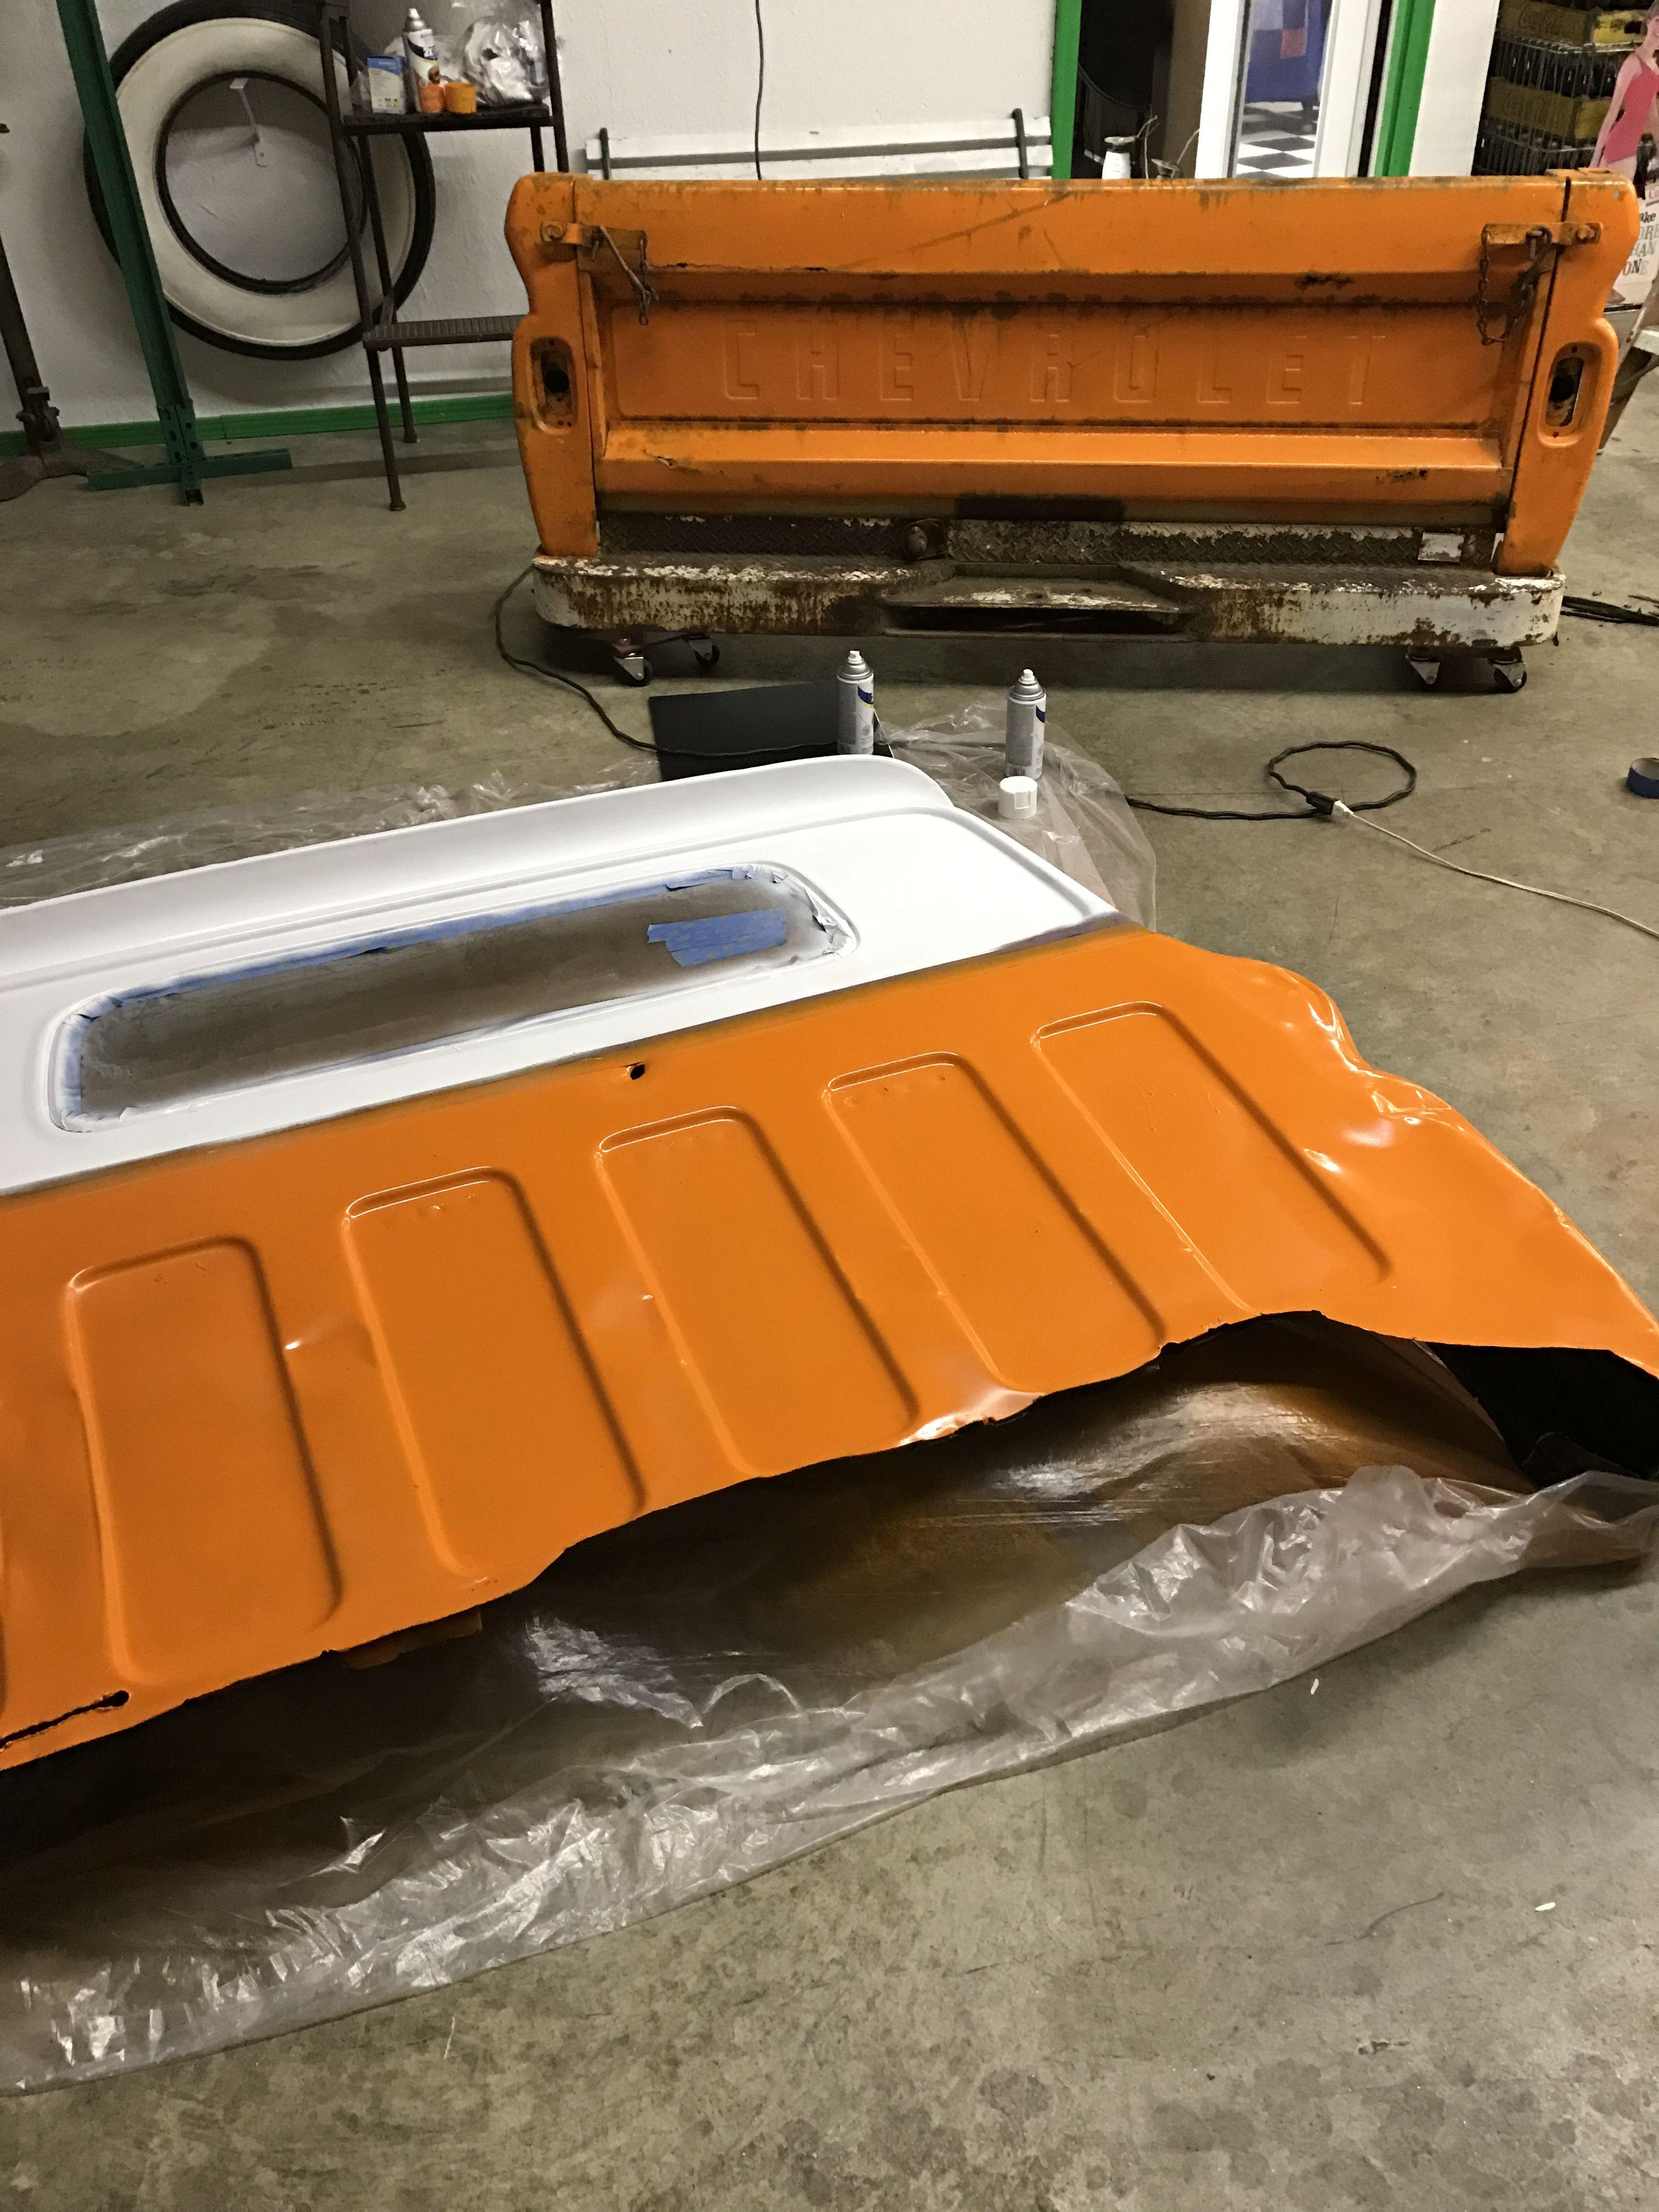 1965 Chevrolet Fleetside Queen size How to make bed